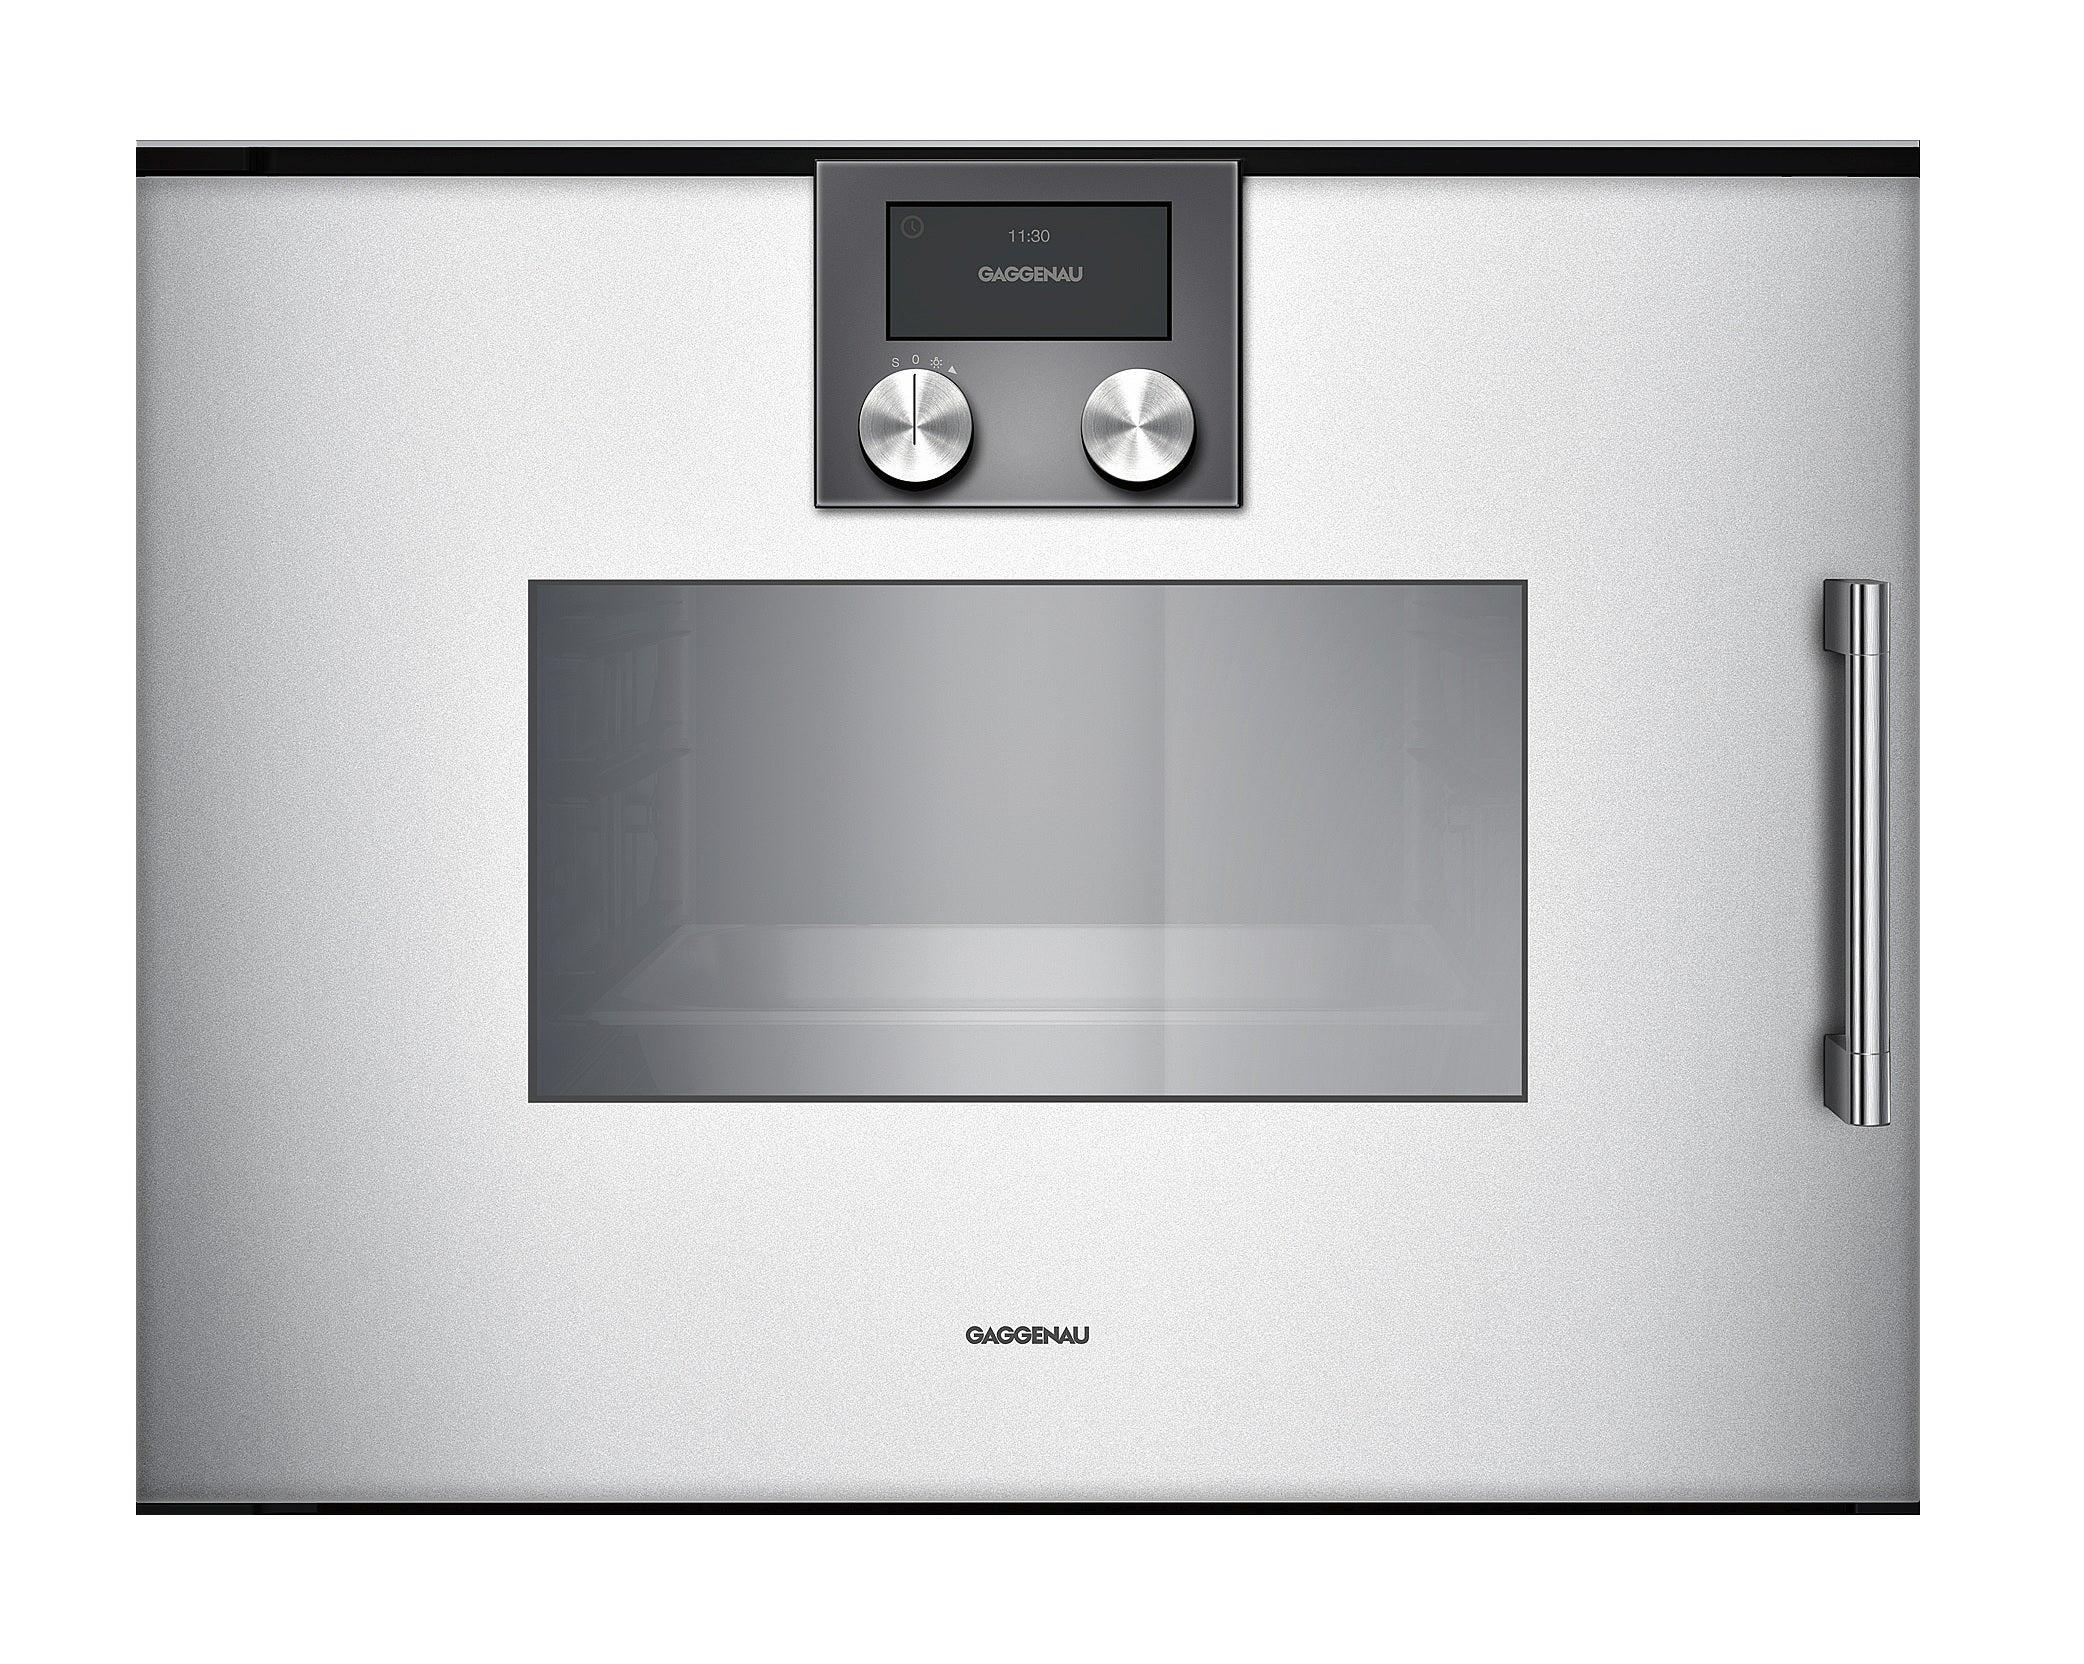 Gaggenau BSP221131 Oven